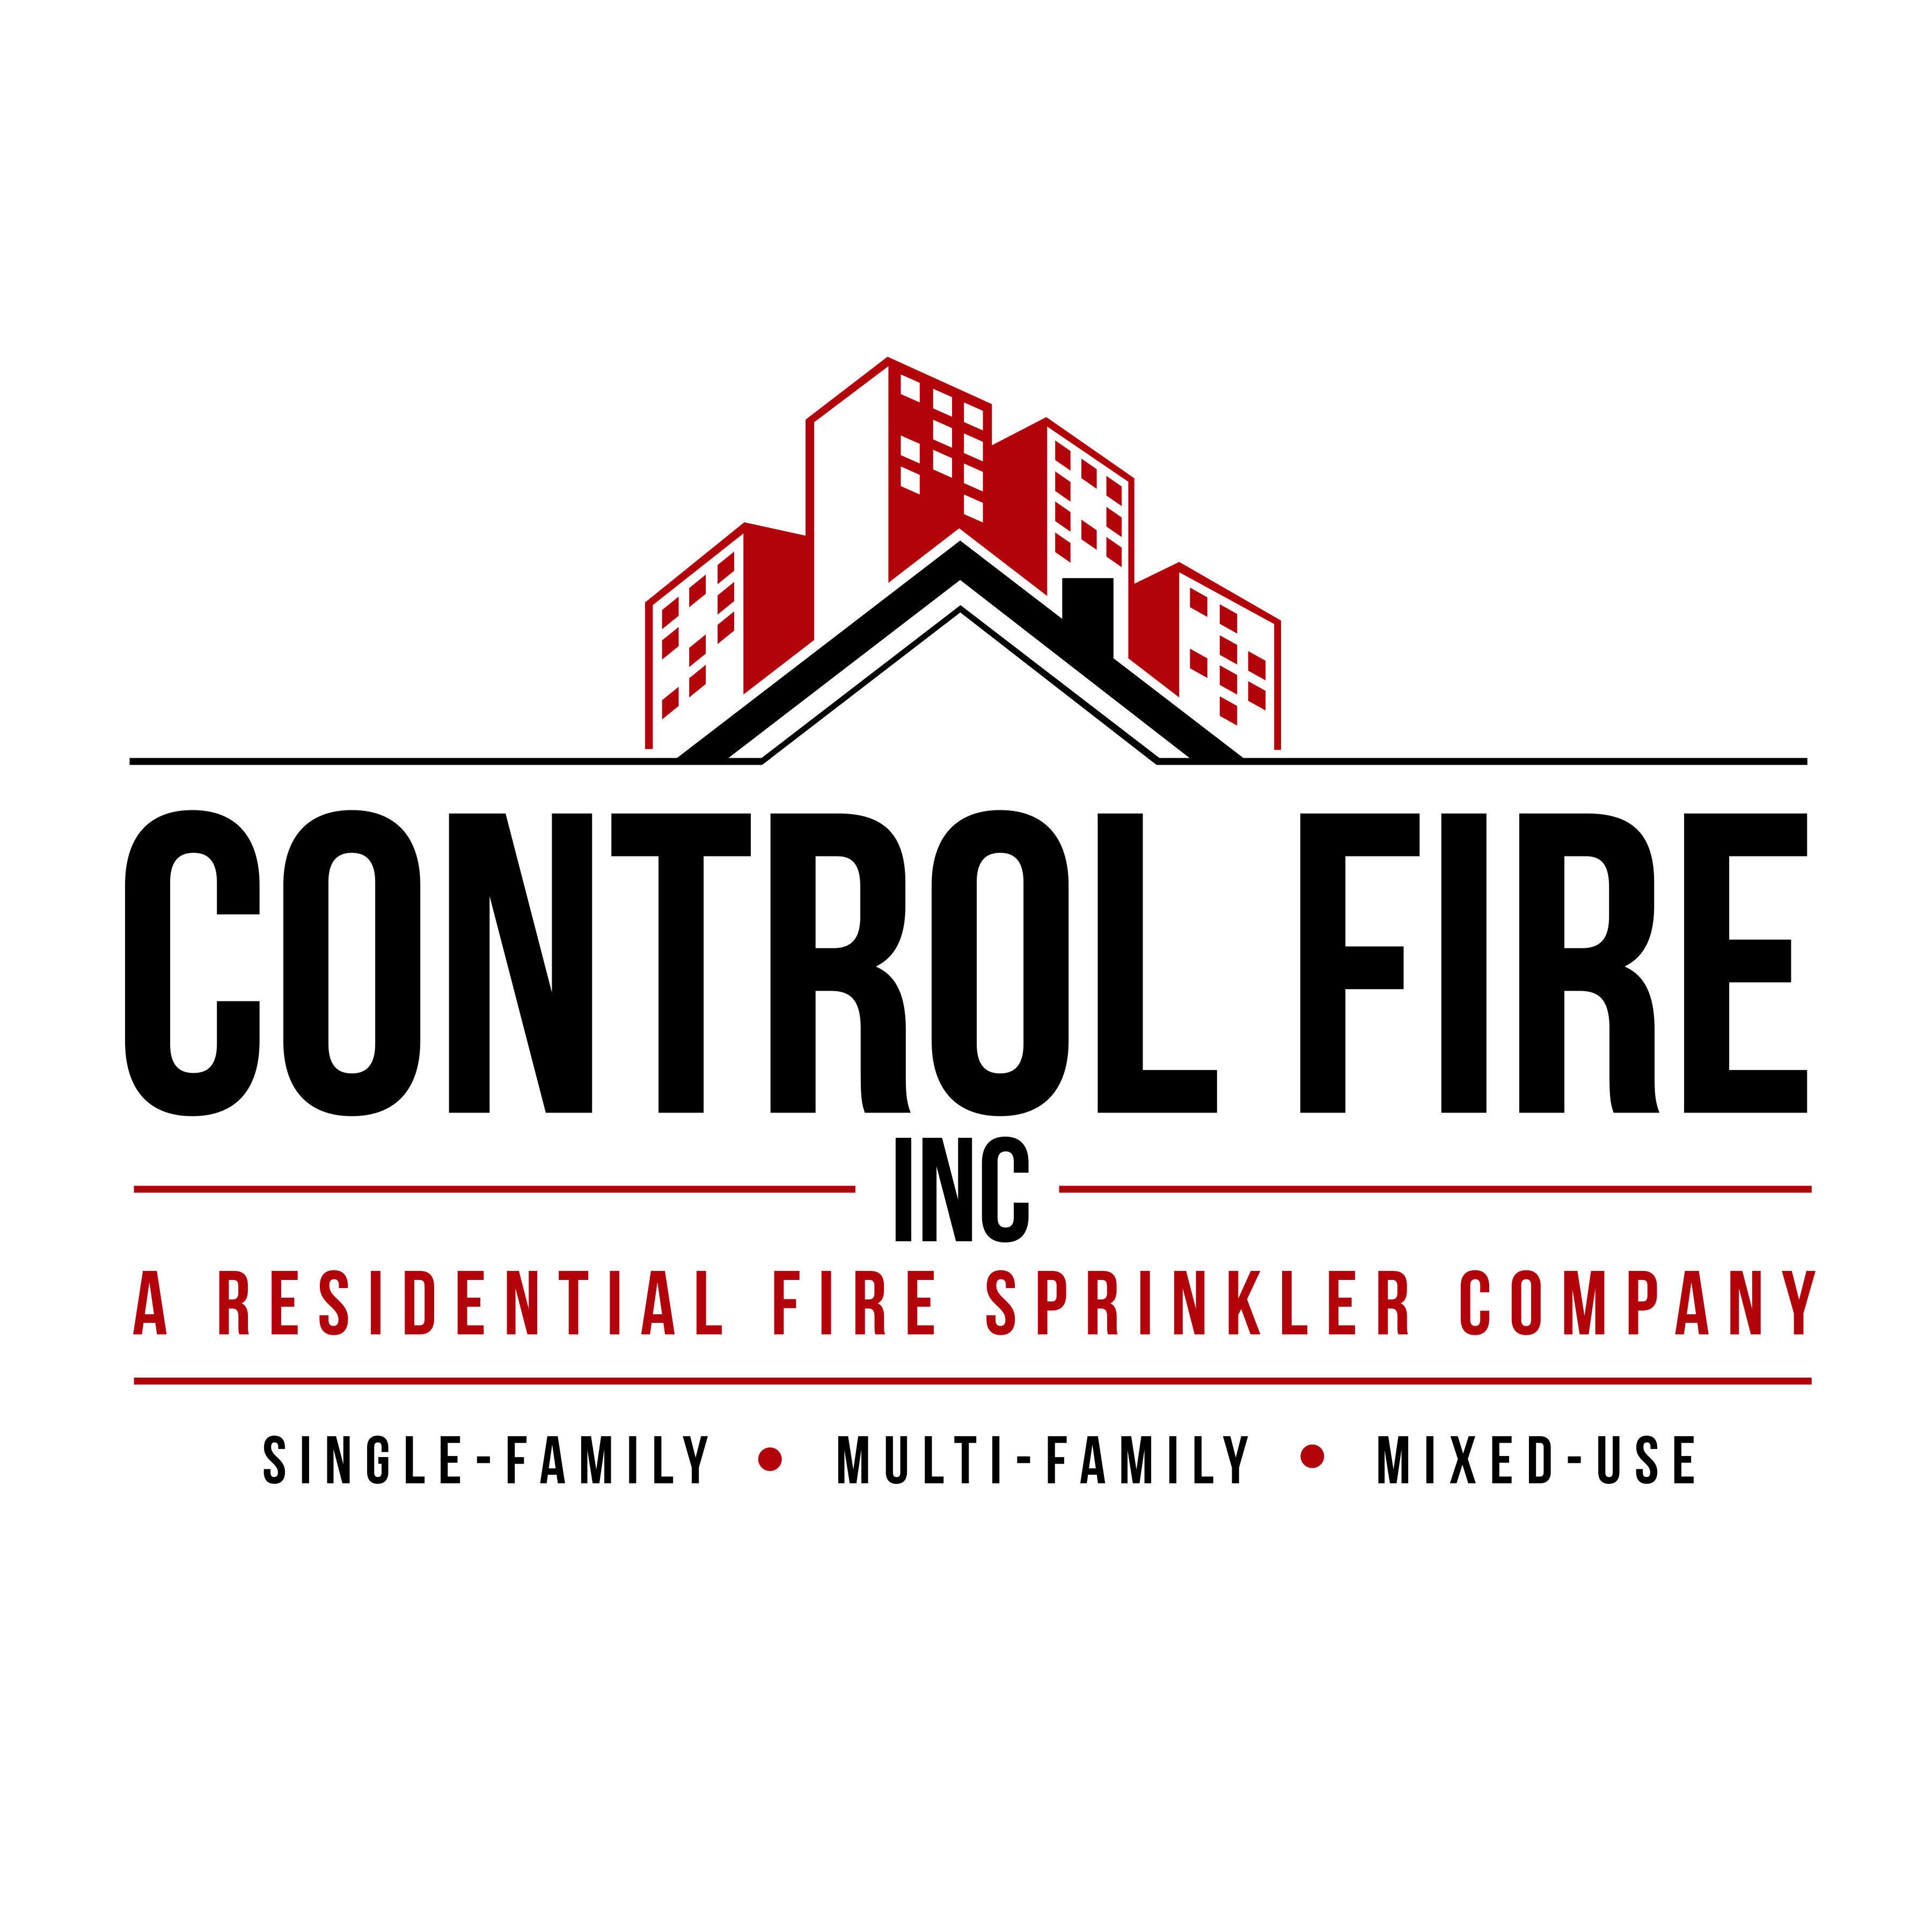 Control Fire, Inc